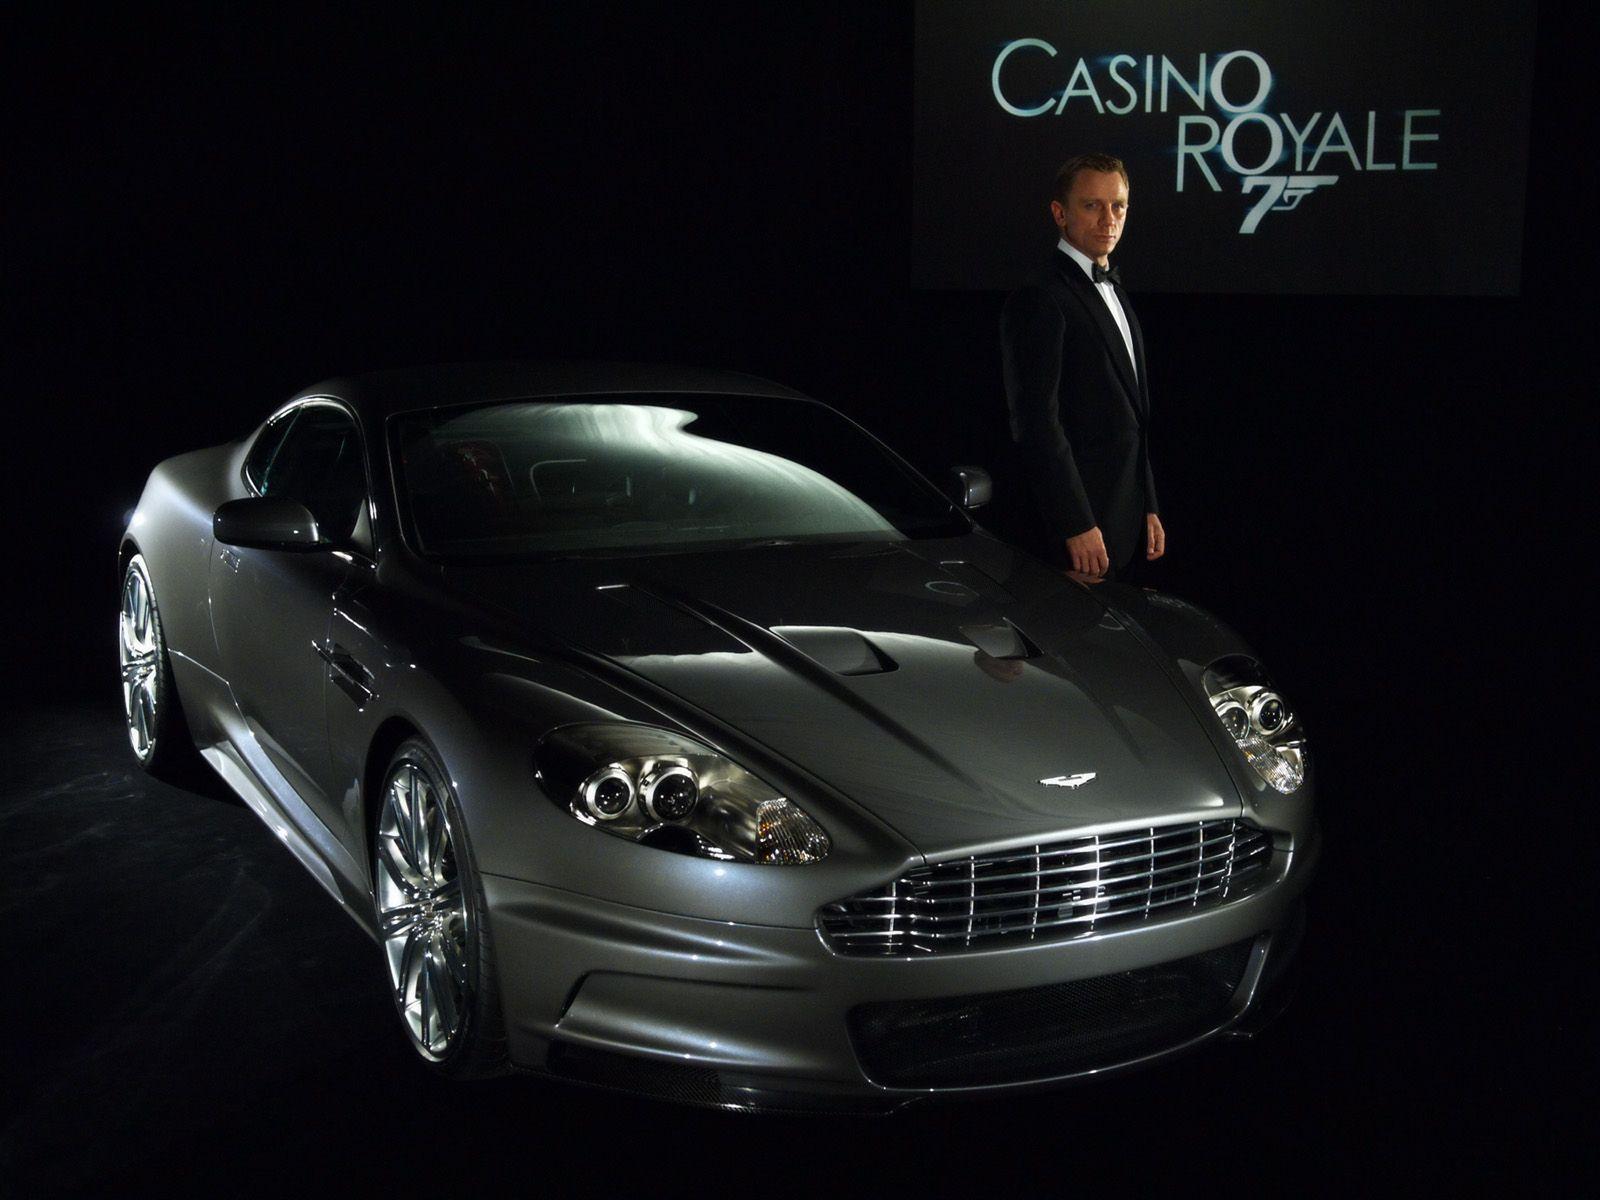 Aston Martin Dbs James Bond Casino Royale Daniel Craig 2006 Aston Martin Dbs James Bond Voiture